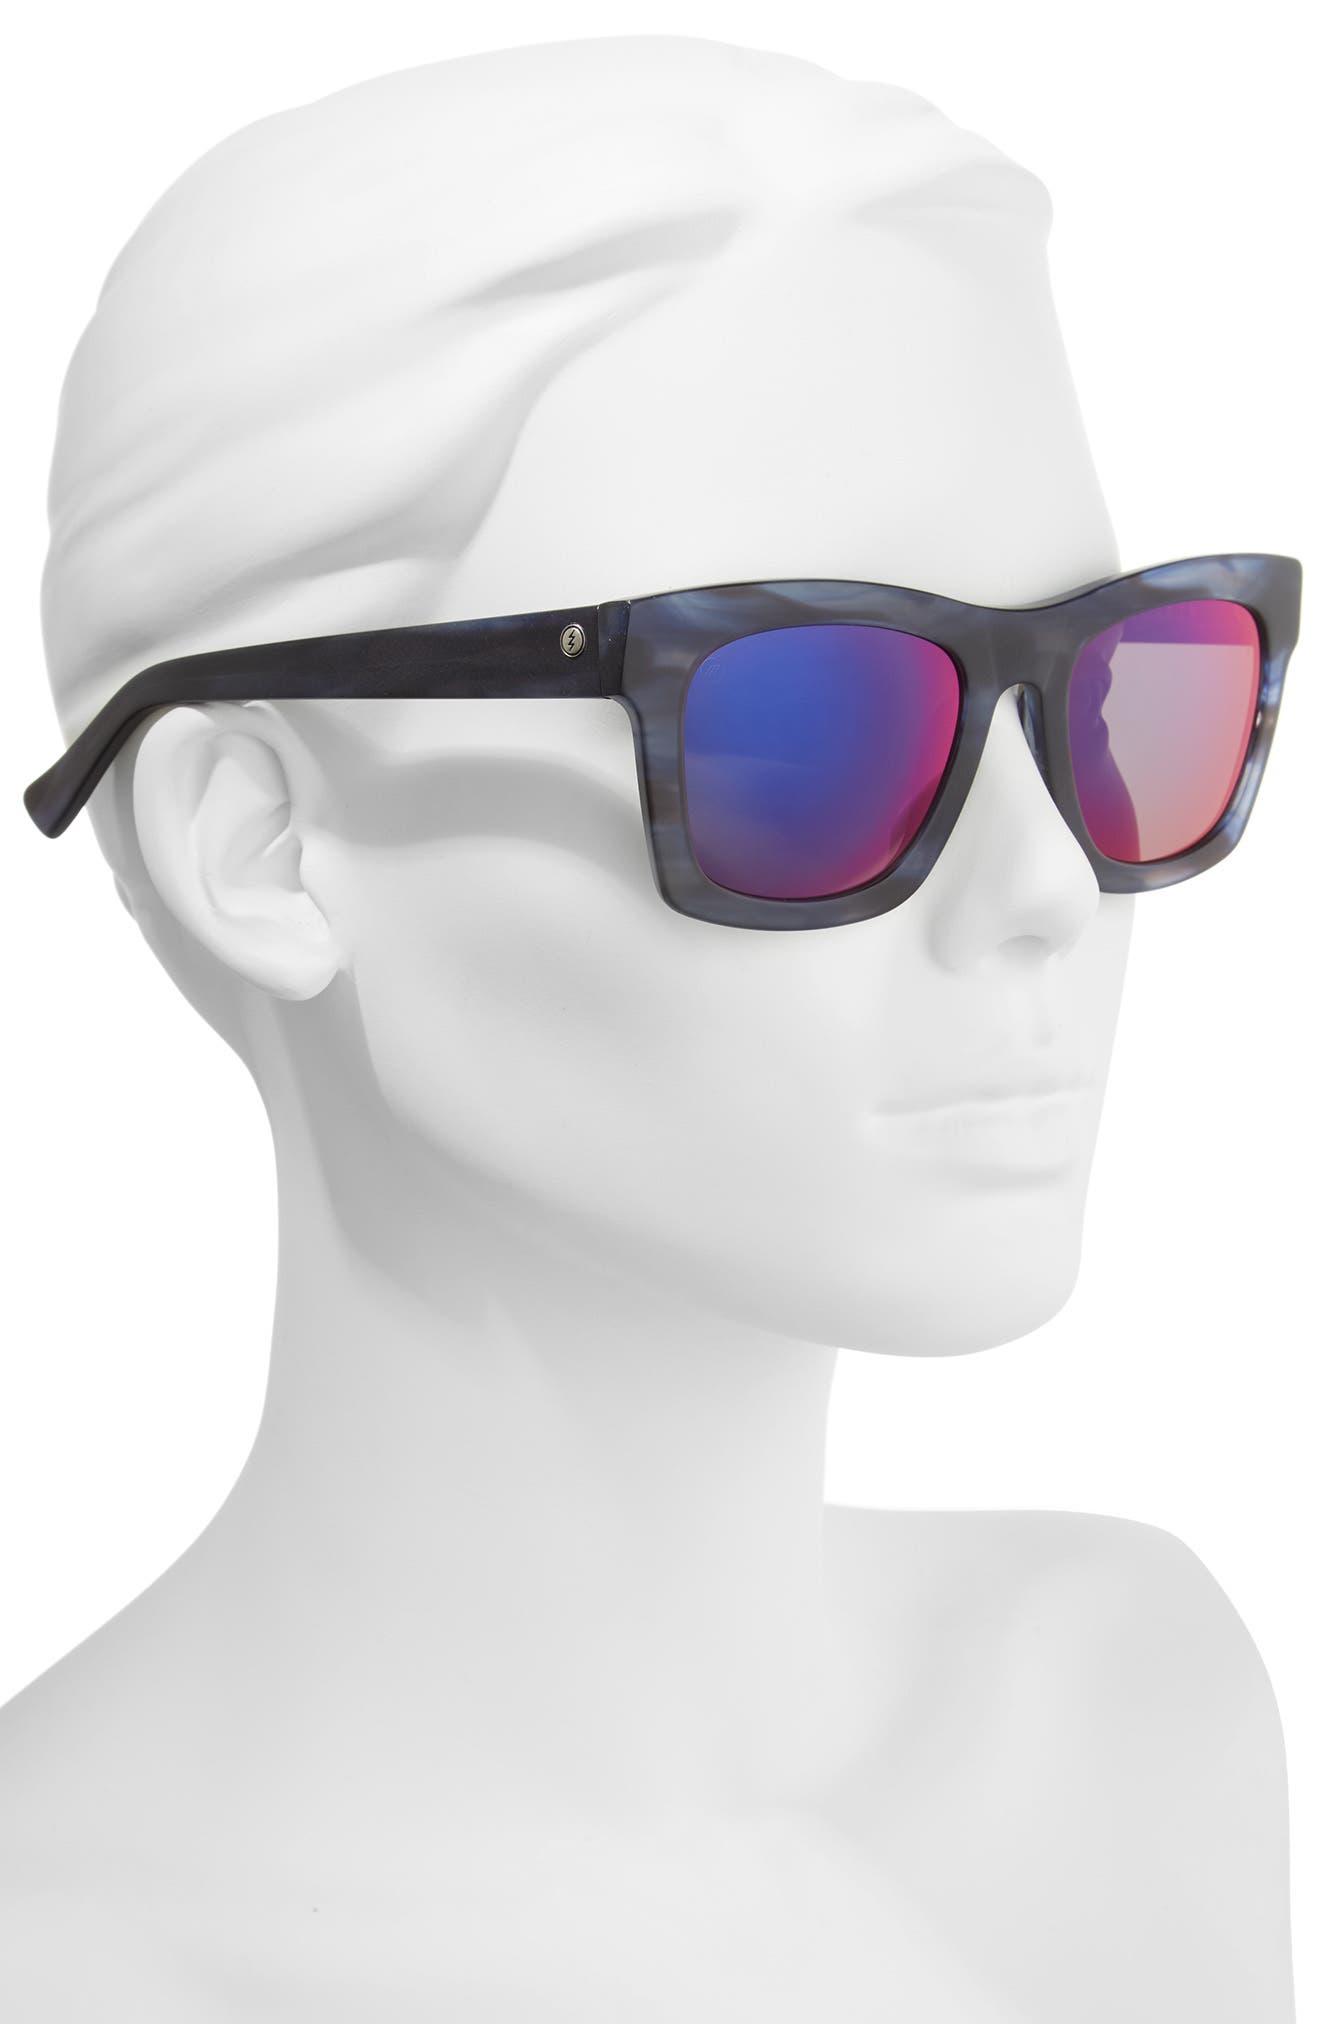 Crasher 53mm Mirrored Sunglasses,                             Alternate thumbnail 4, color,                             Skyline/ Plasma